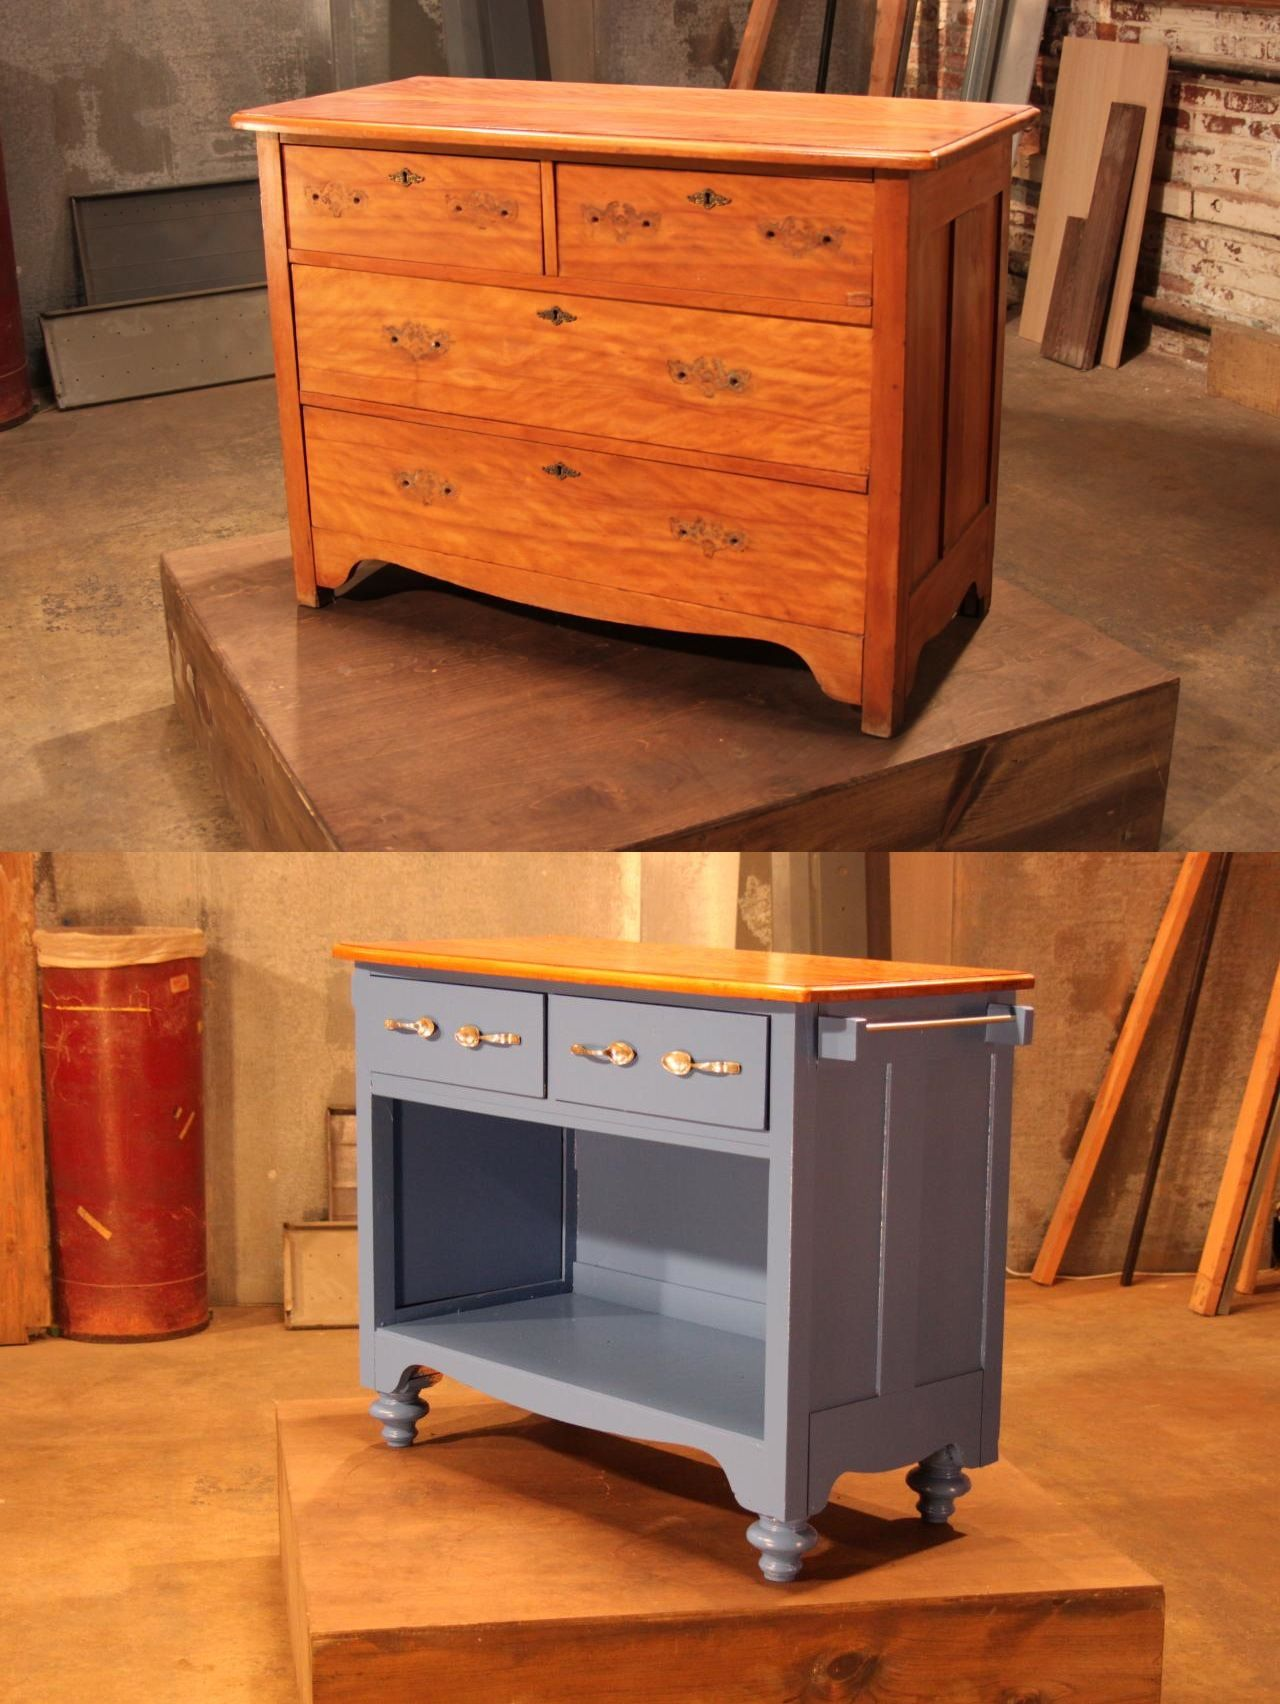 Dresser Repurposed As Kitchen Island Muebles  Pinterest Interesting Affordable Kitchen Islands Inspiration